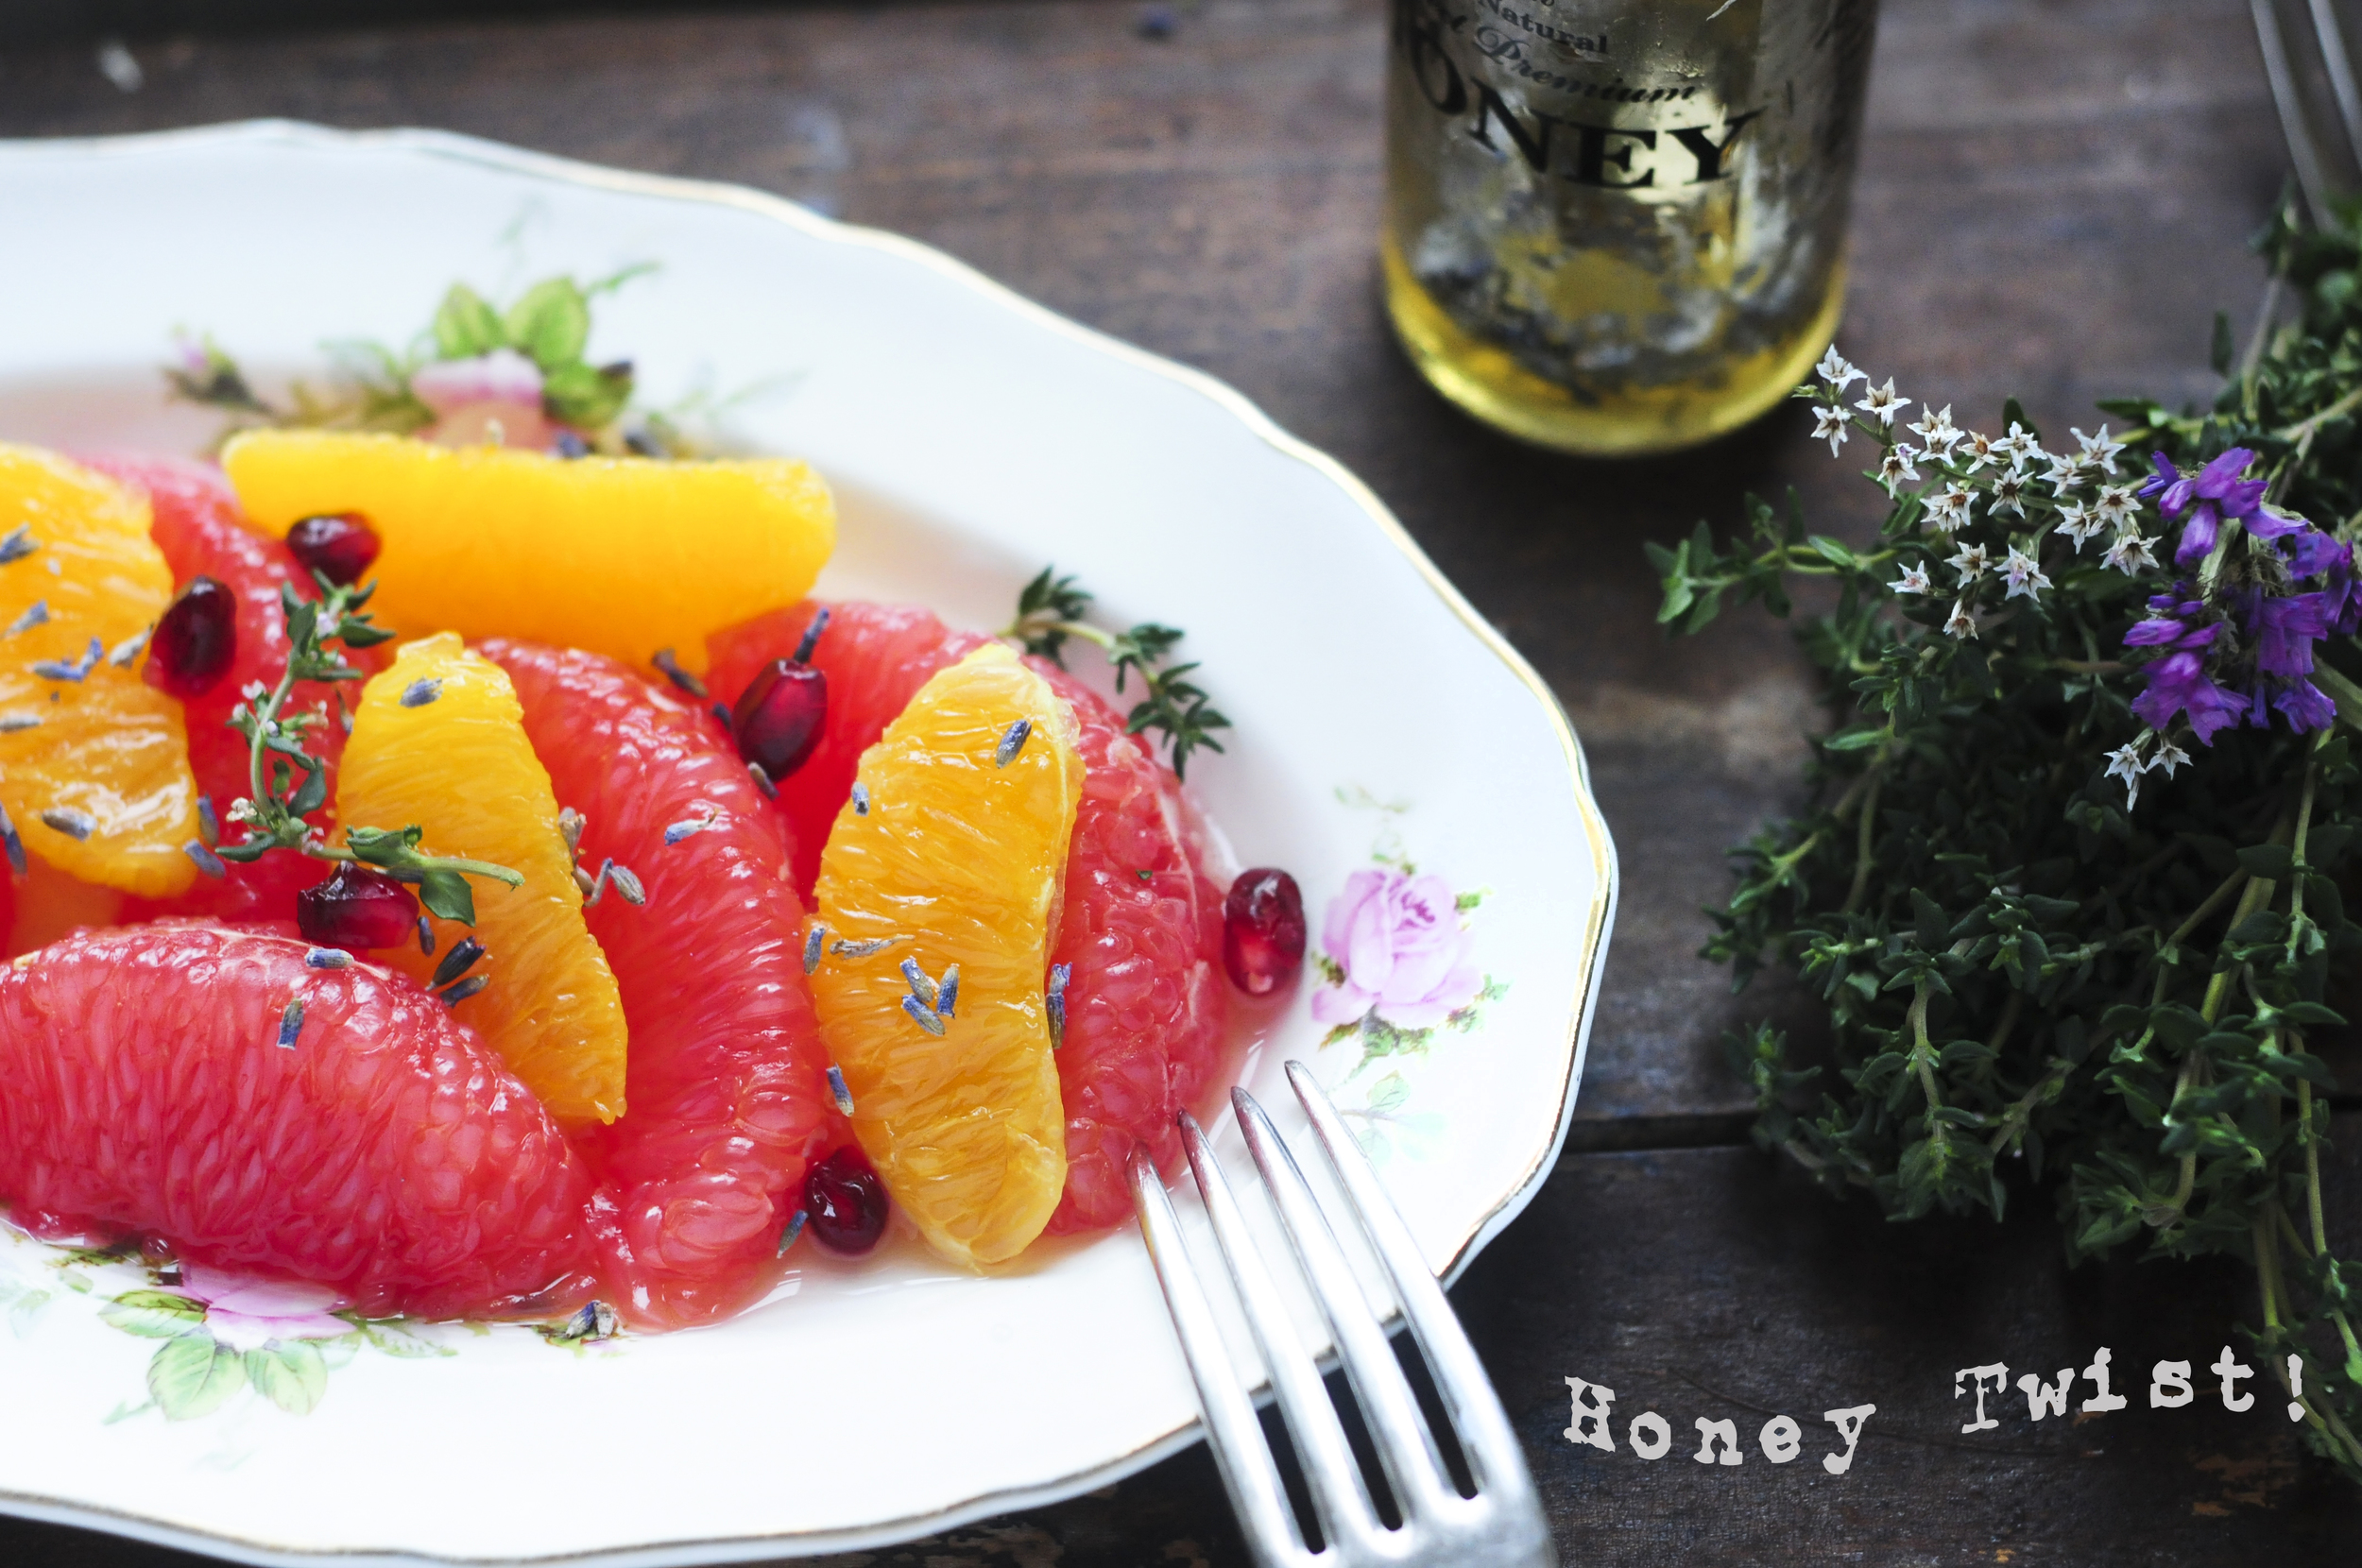 a.big.honey.twist.grapefruit.orange.lavender.pomegranate.thyme.salad.bee.DSC_3328.jpg